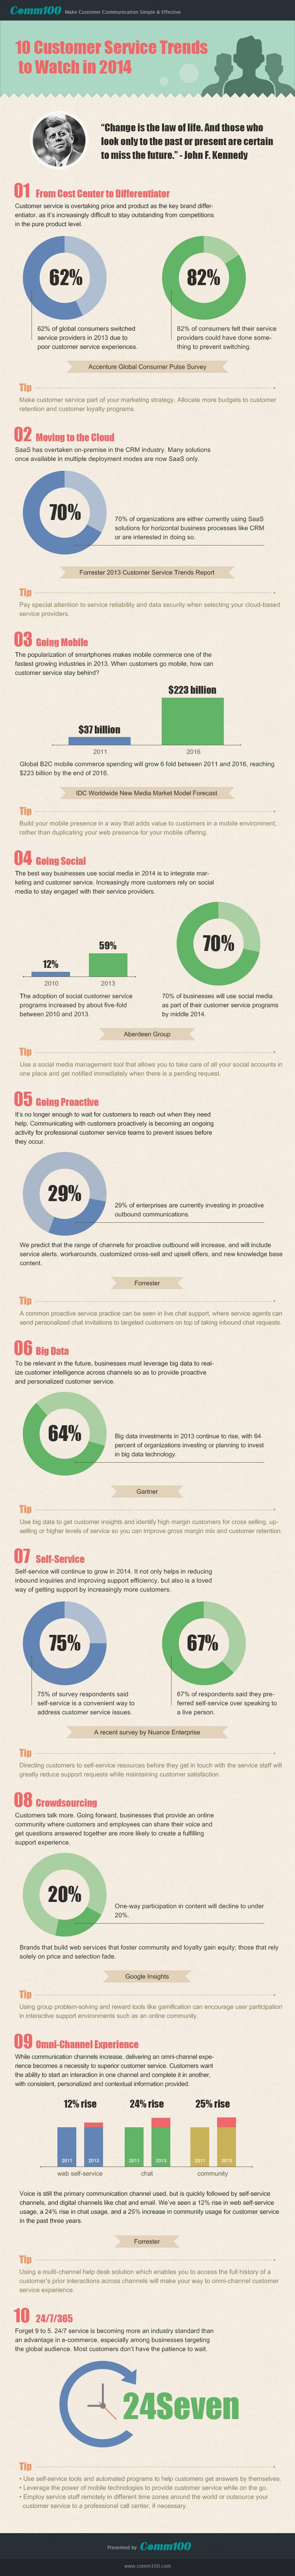 Customer-Service-Trends